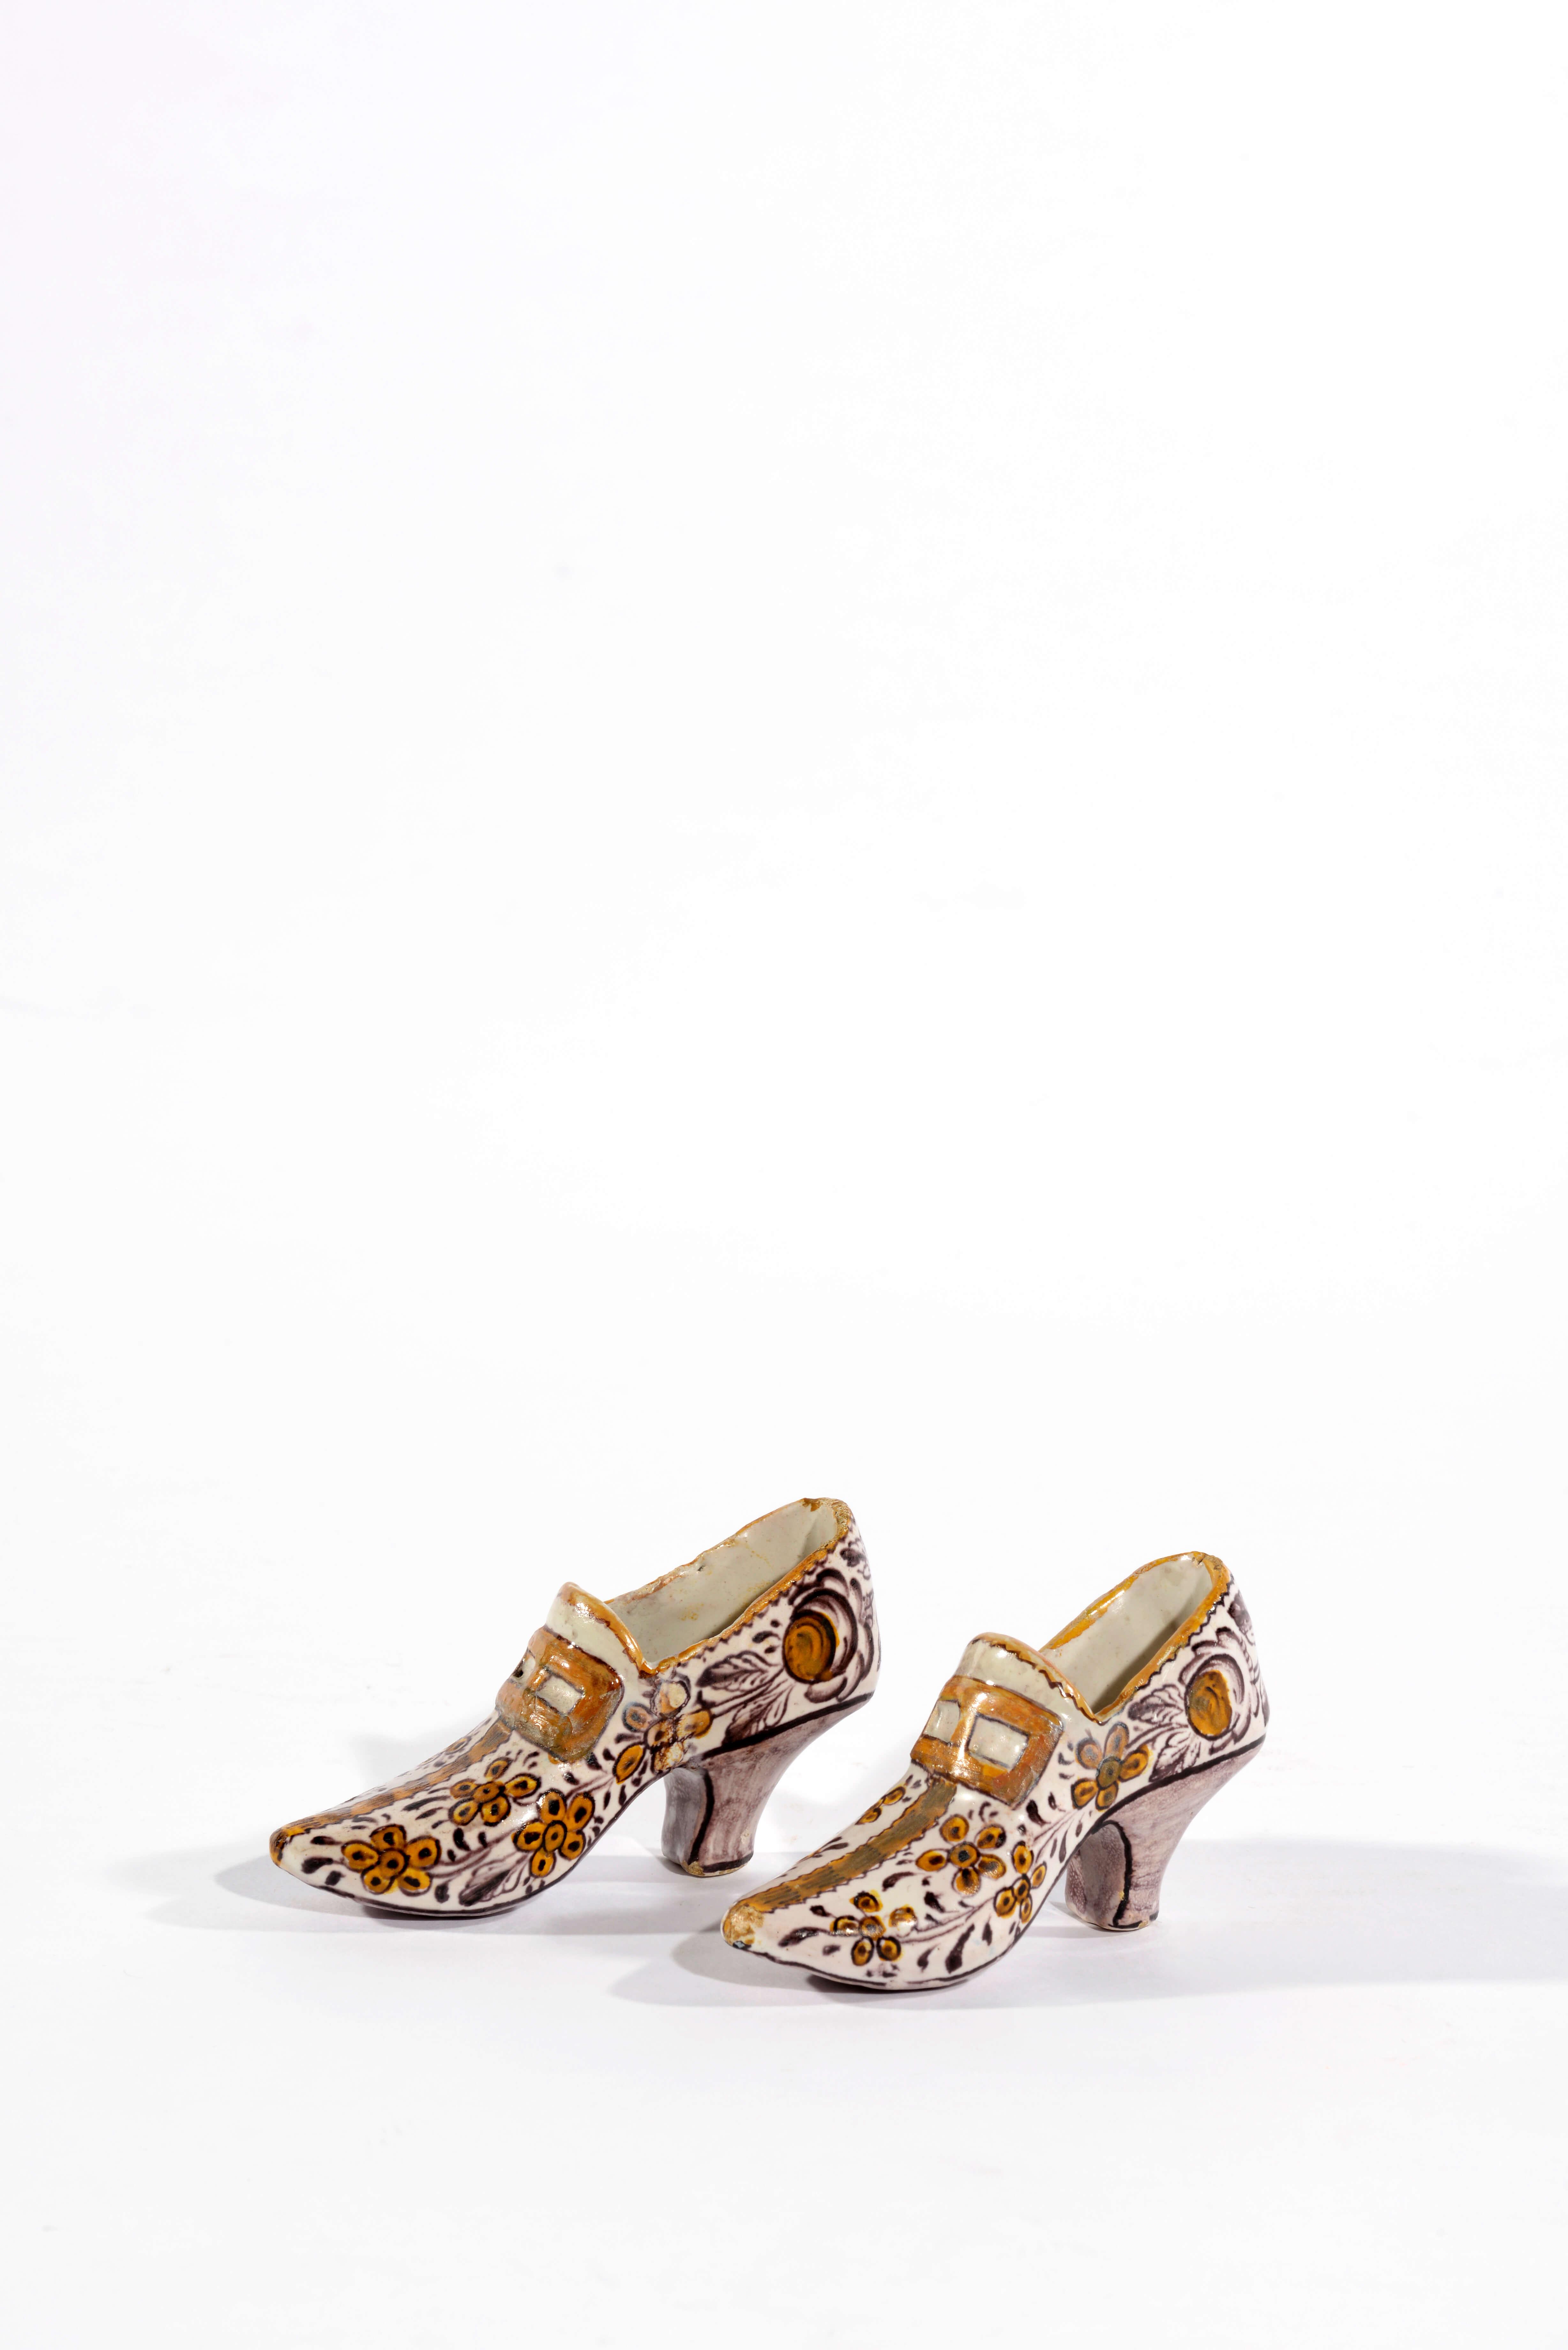 1648 Polychrome Shoes